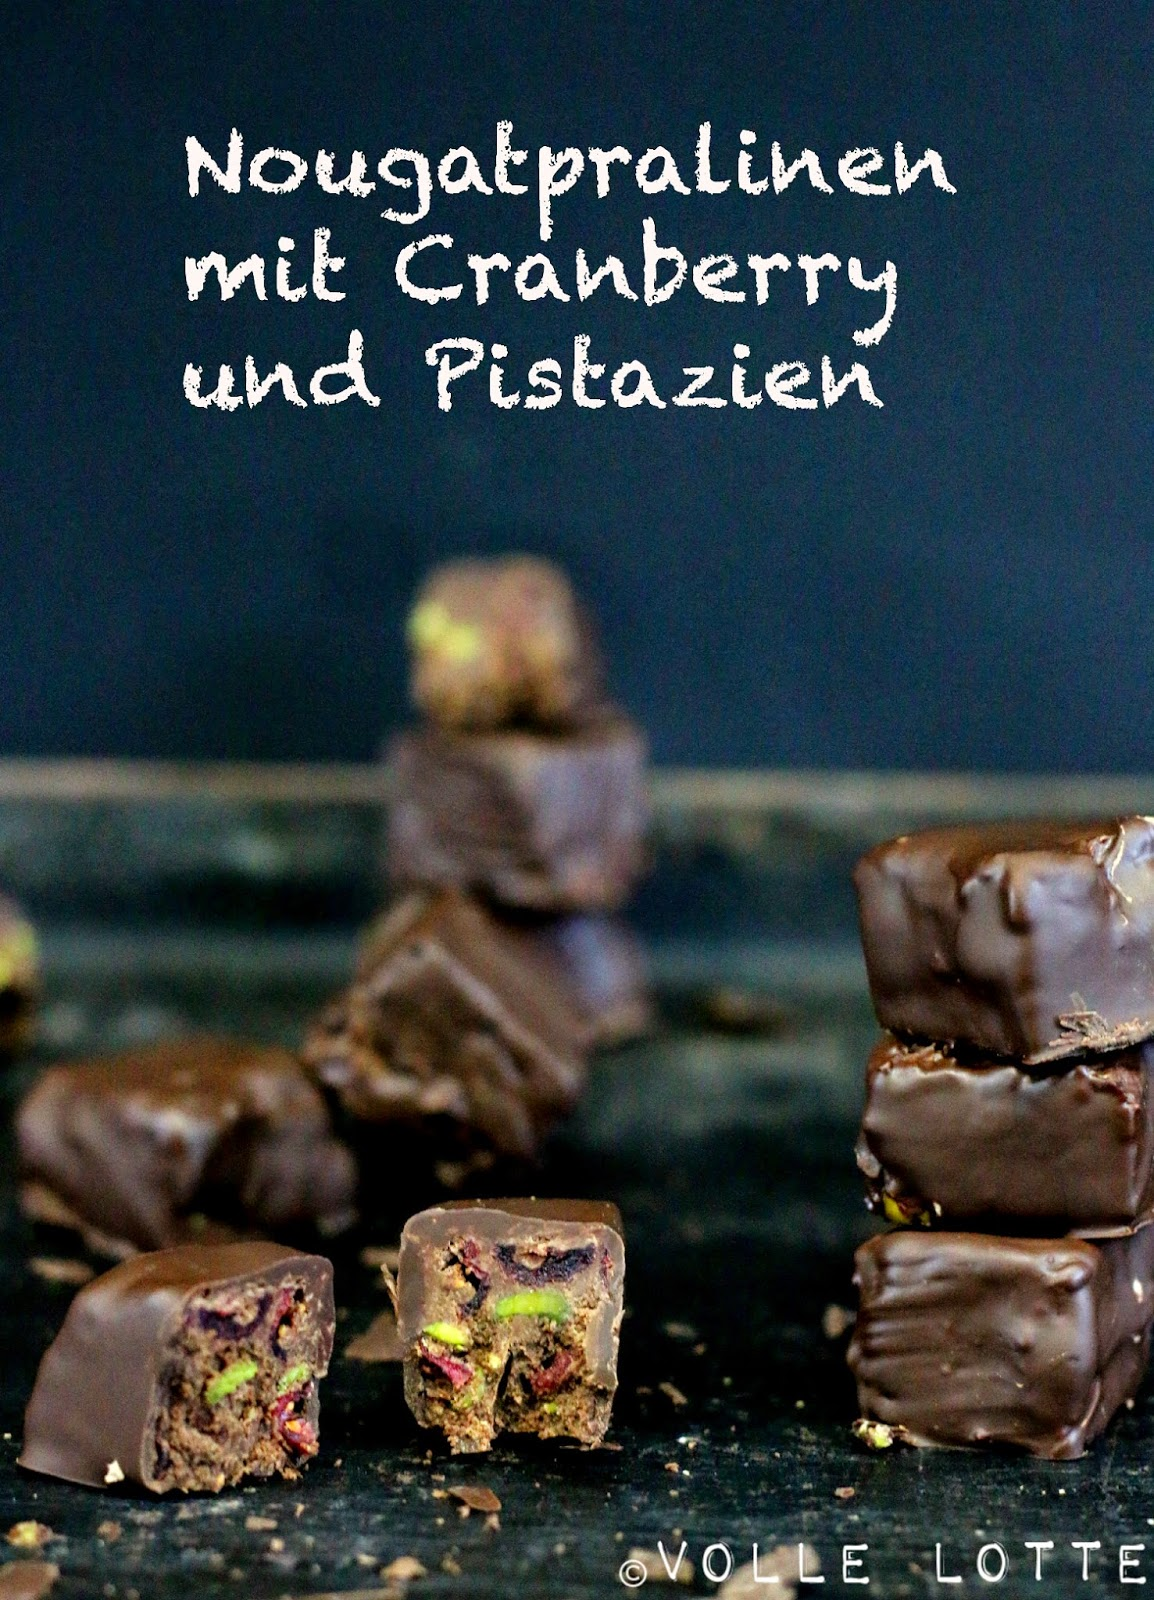 Cranberry, Pistazien, Schokolade